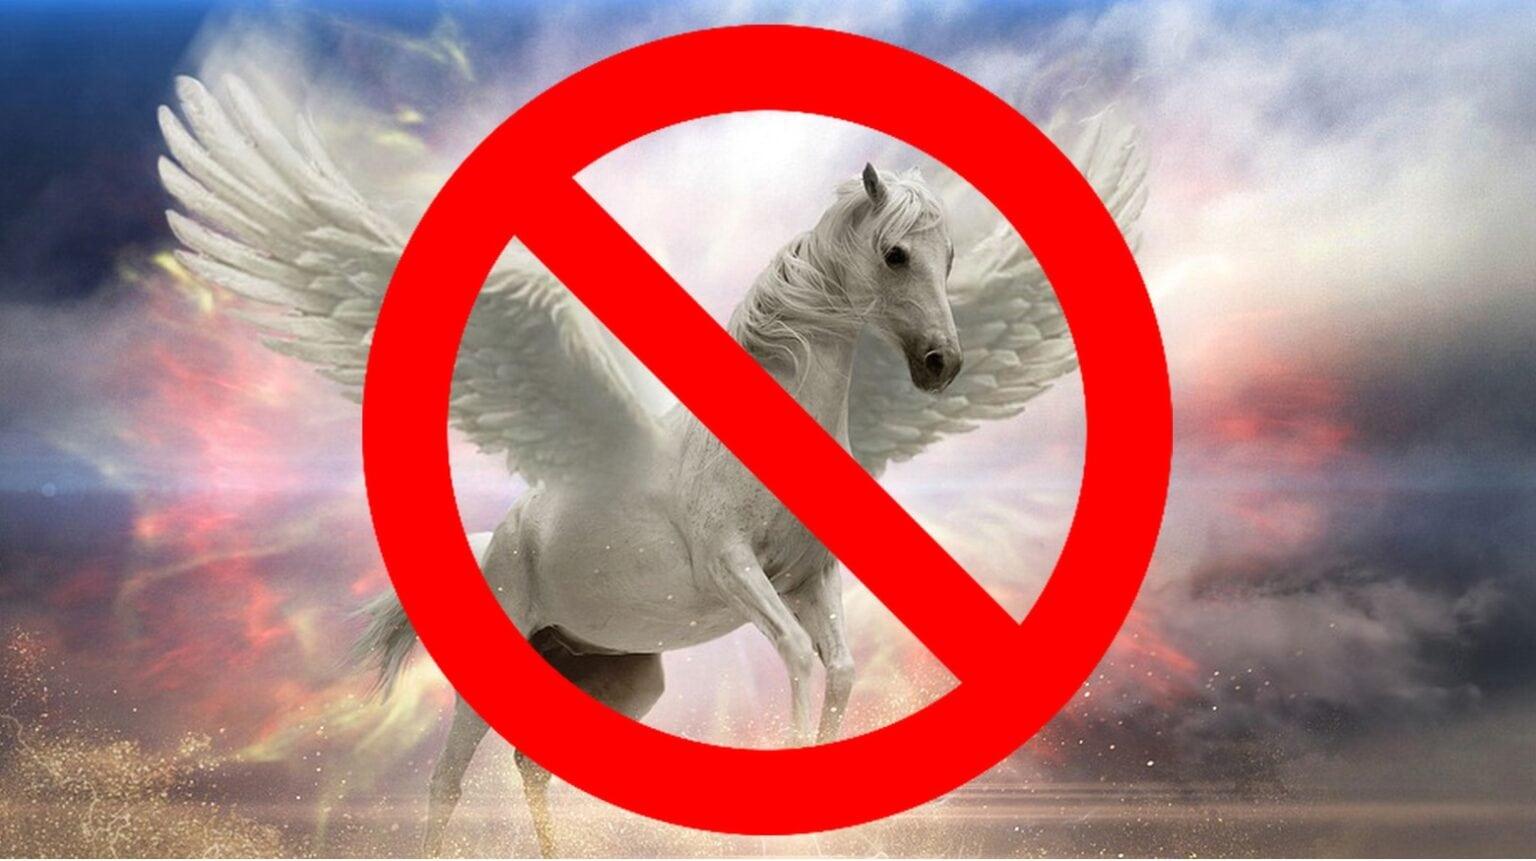 iOS 12.5.5 update blocks Pegasus spyware from older iPhones